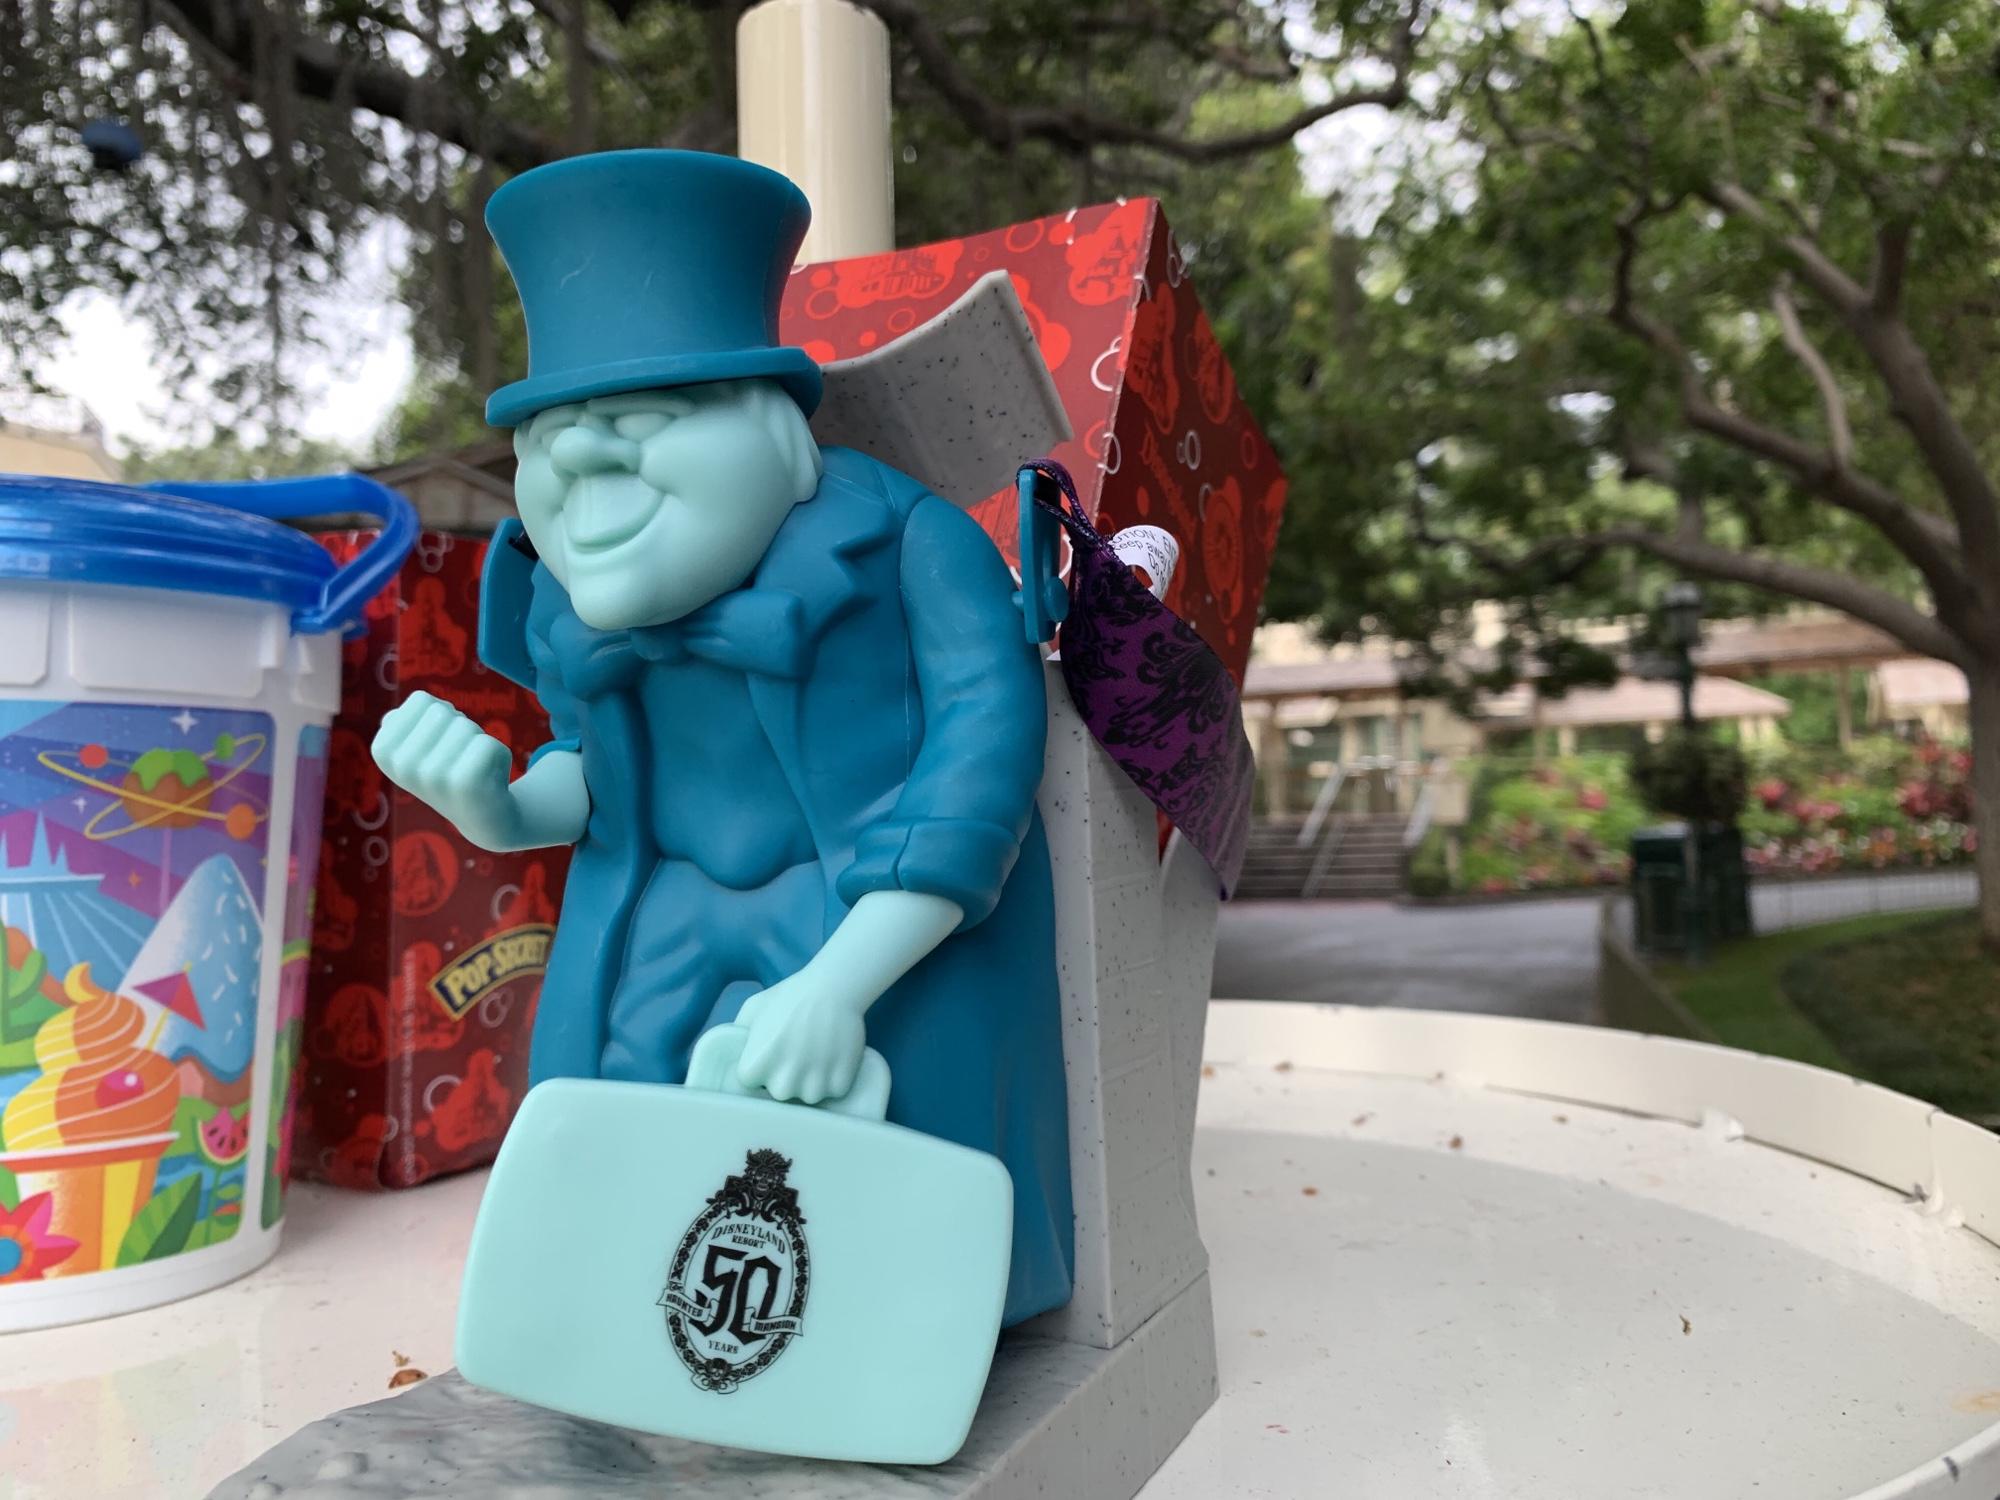 Disneyland Halloween Popcorn Bucket 2019.Hitchhiking Ghost Phineas Popcorn Bucket Debuts In